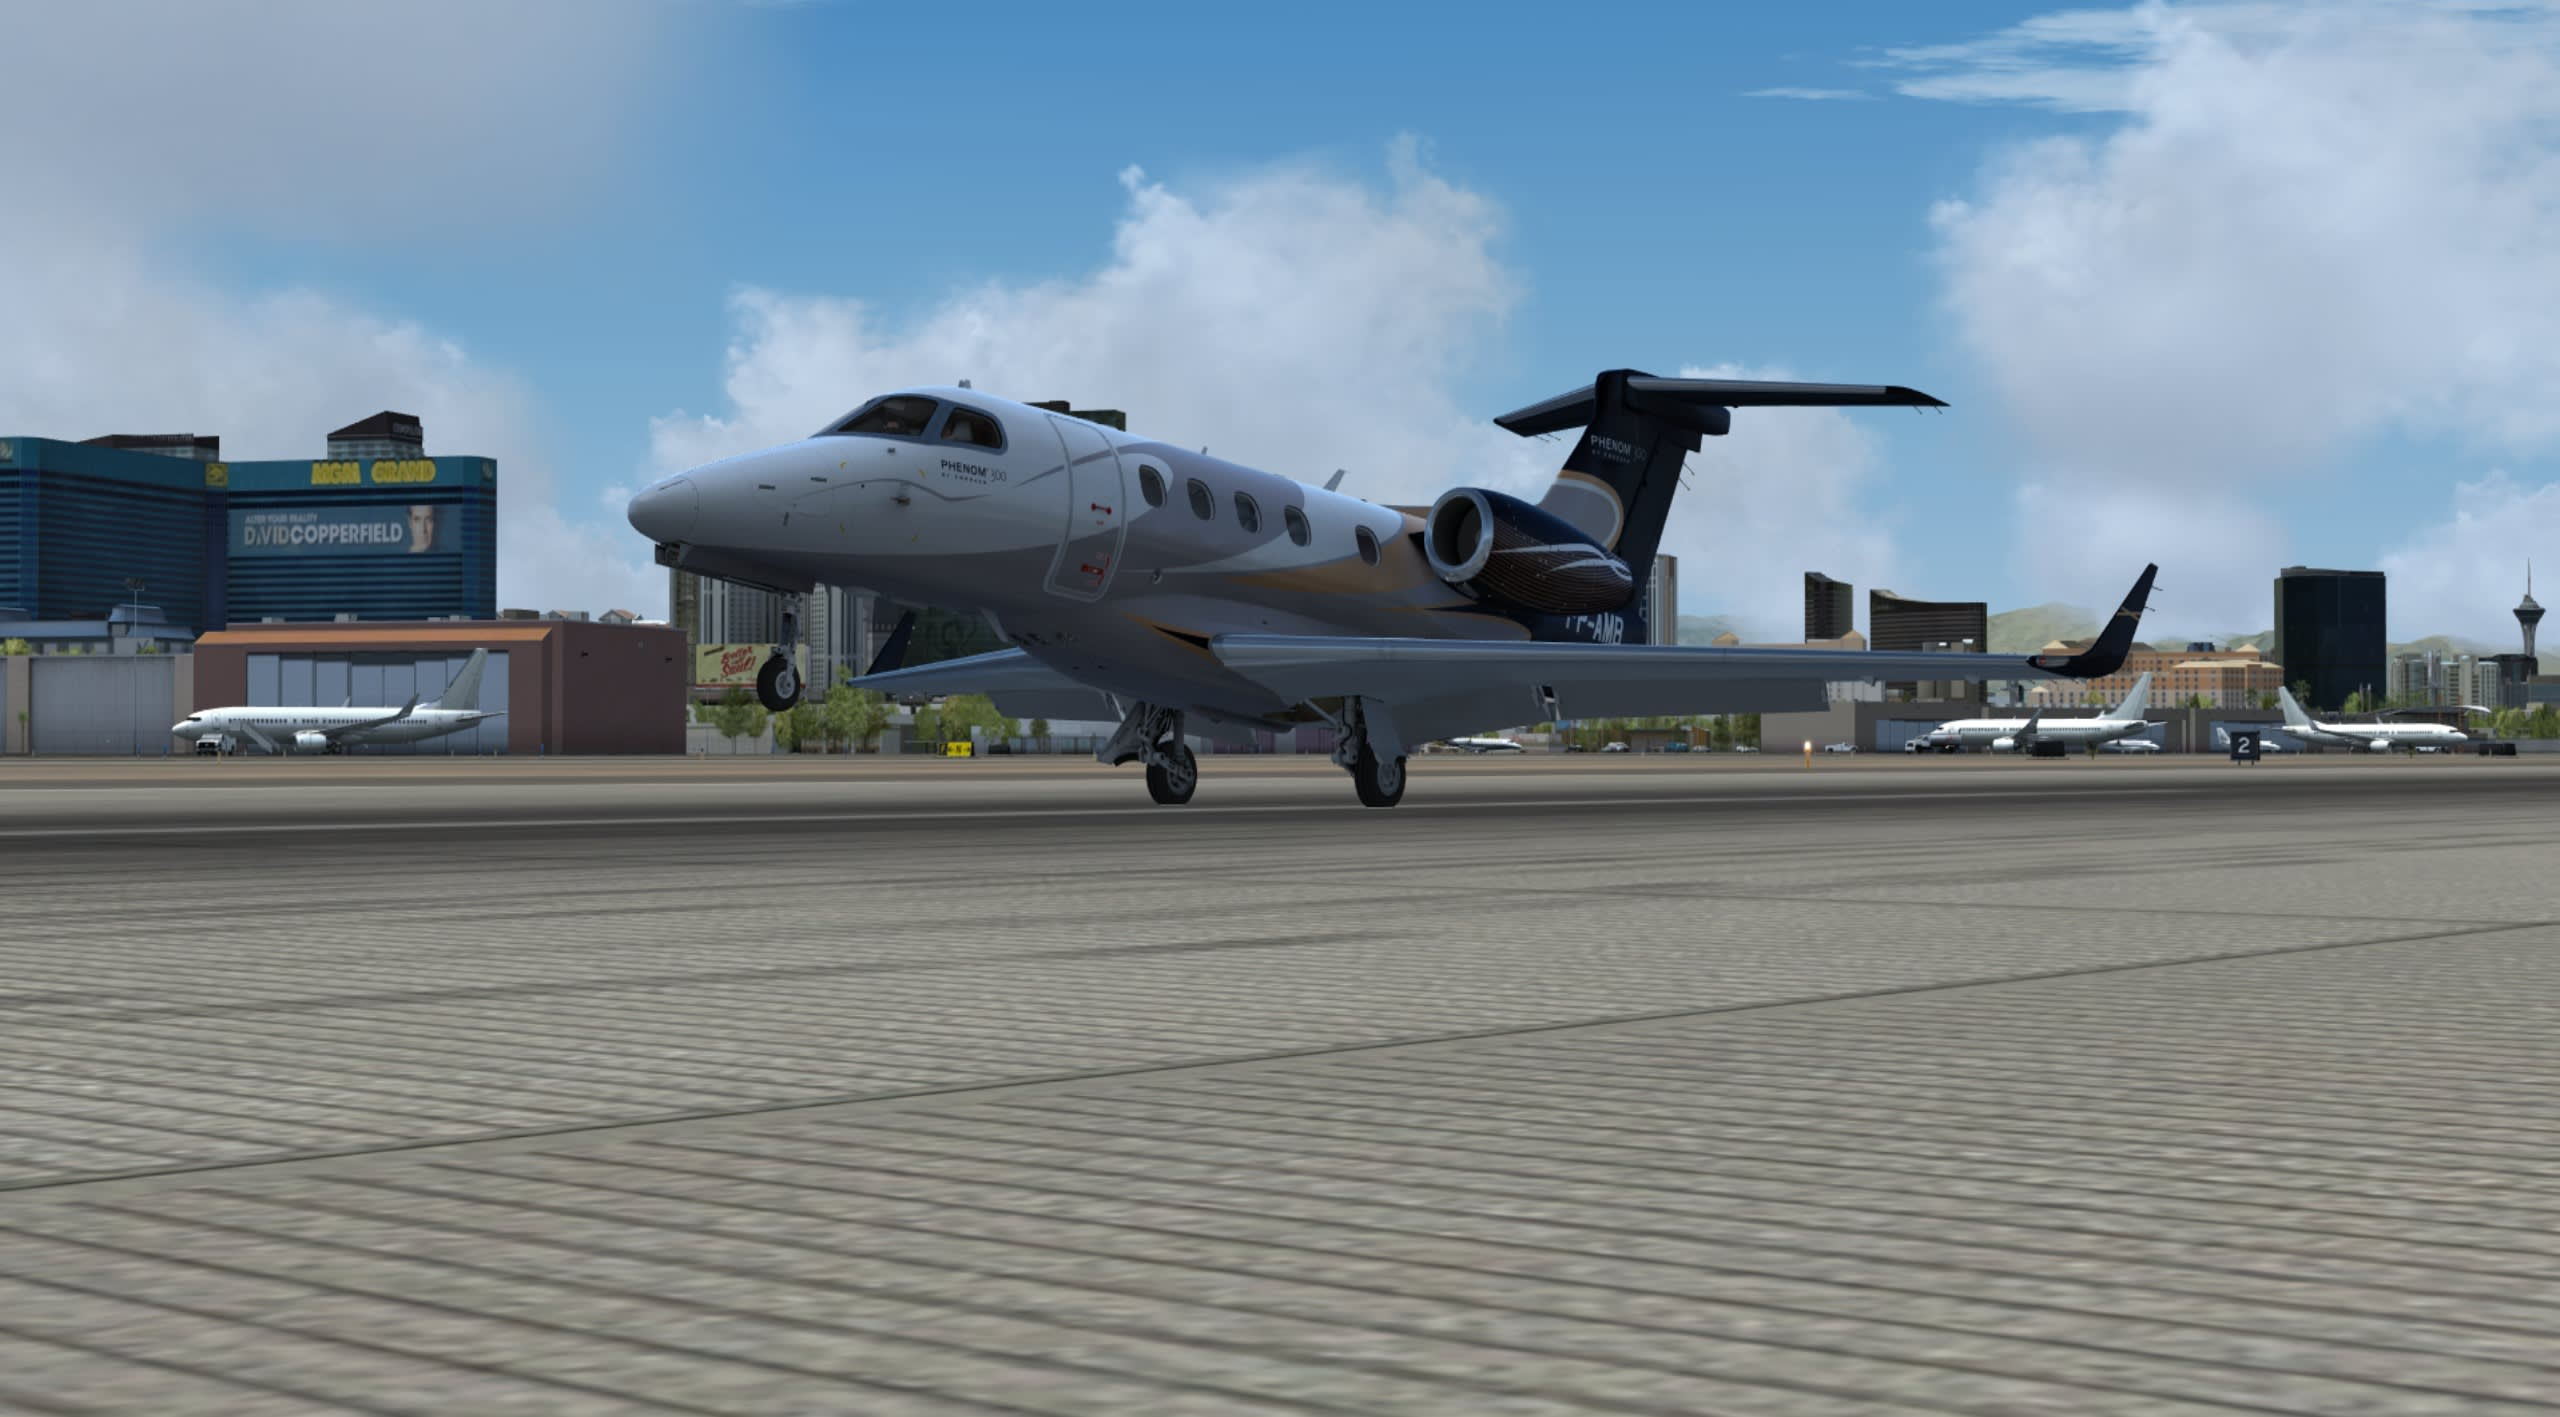 Privat Jet Tour. Screenshot taken by Pablo Bandera